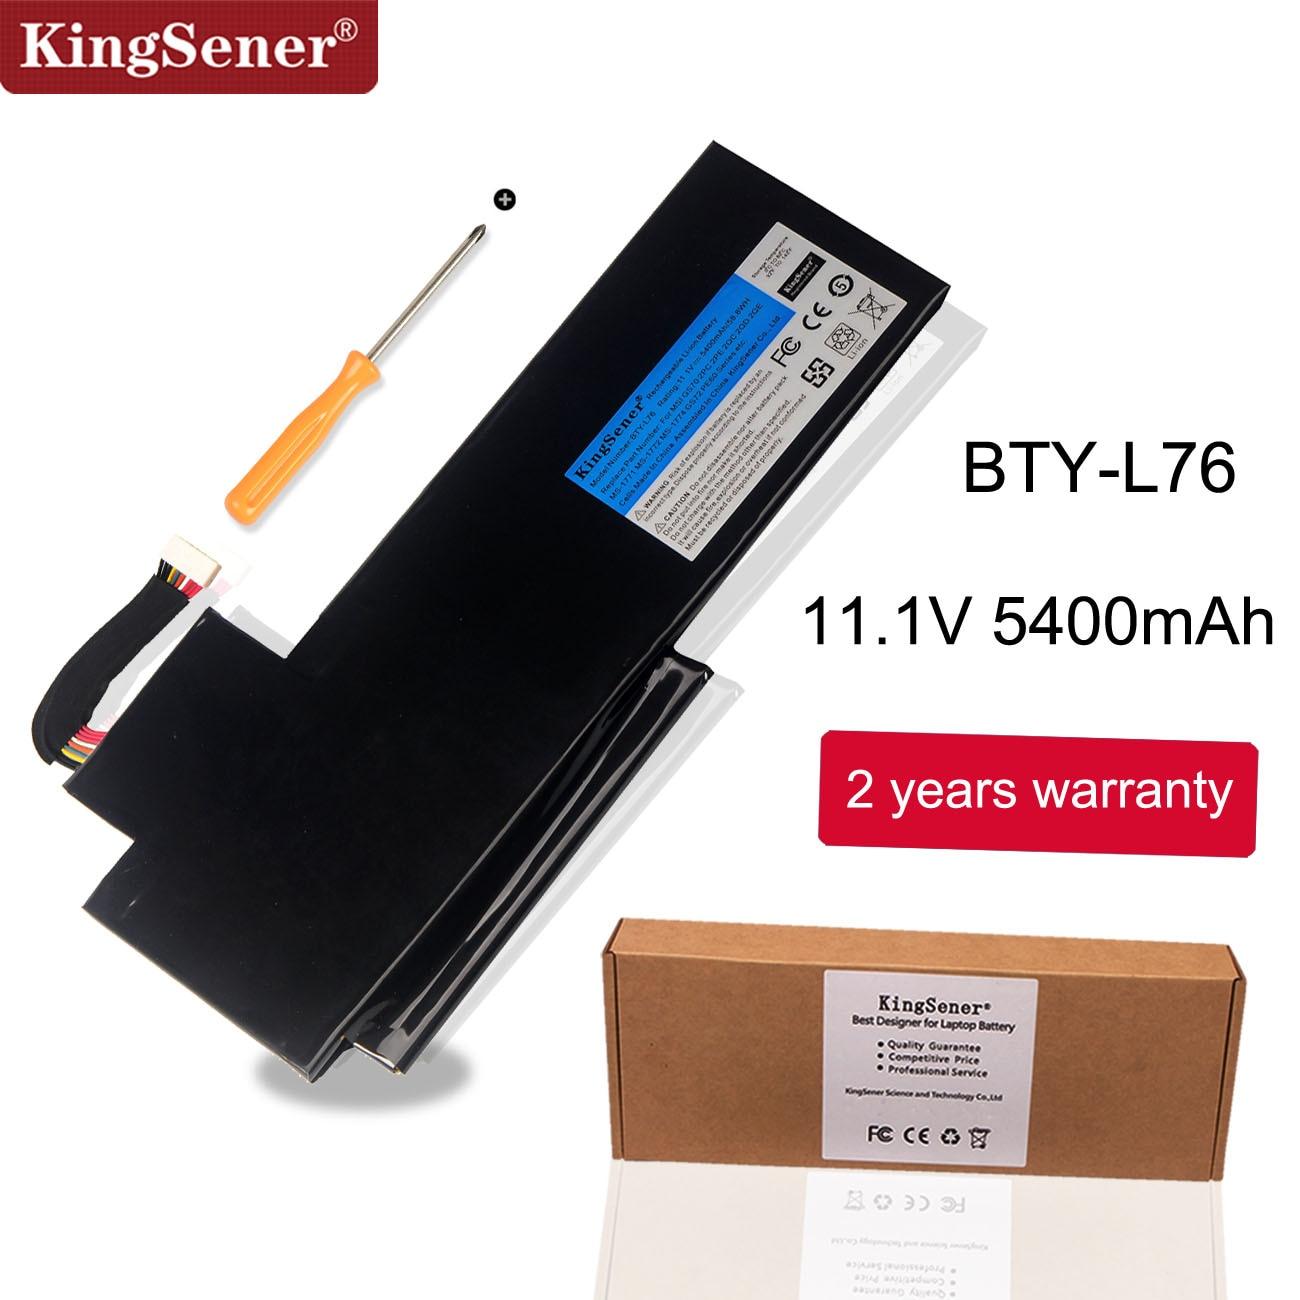 msi ms 7613 - KingSener BTY-L76 Battery For MSI GS70 2OD 2PC 2PE 2QC 2QD 2QE GS72 MS-1771 MS-1772 MS-1773 MS-1774 For MEDION X7613 MD98802